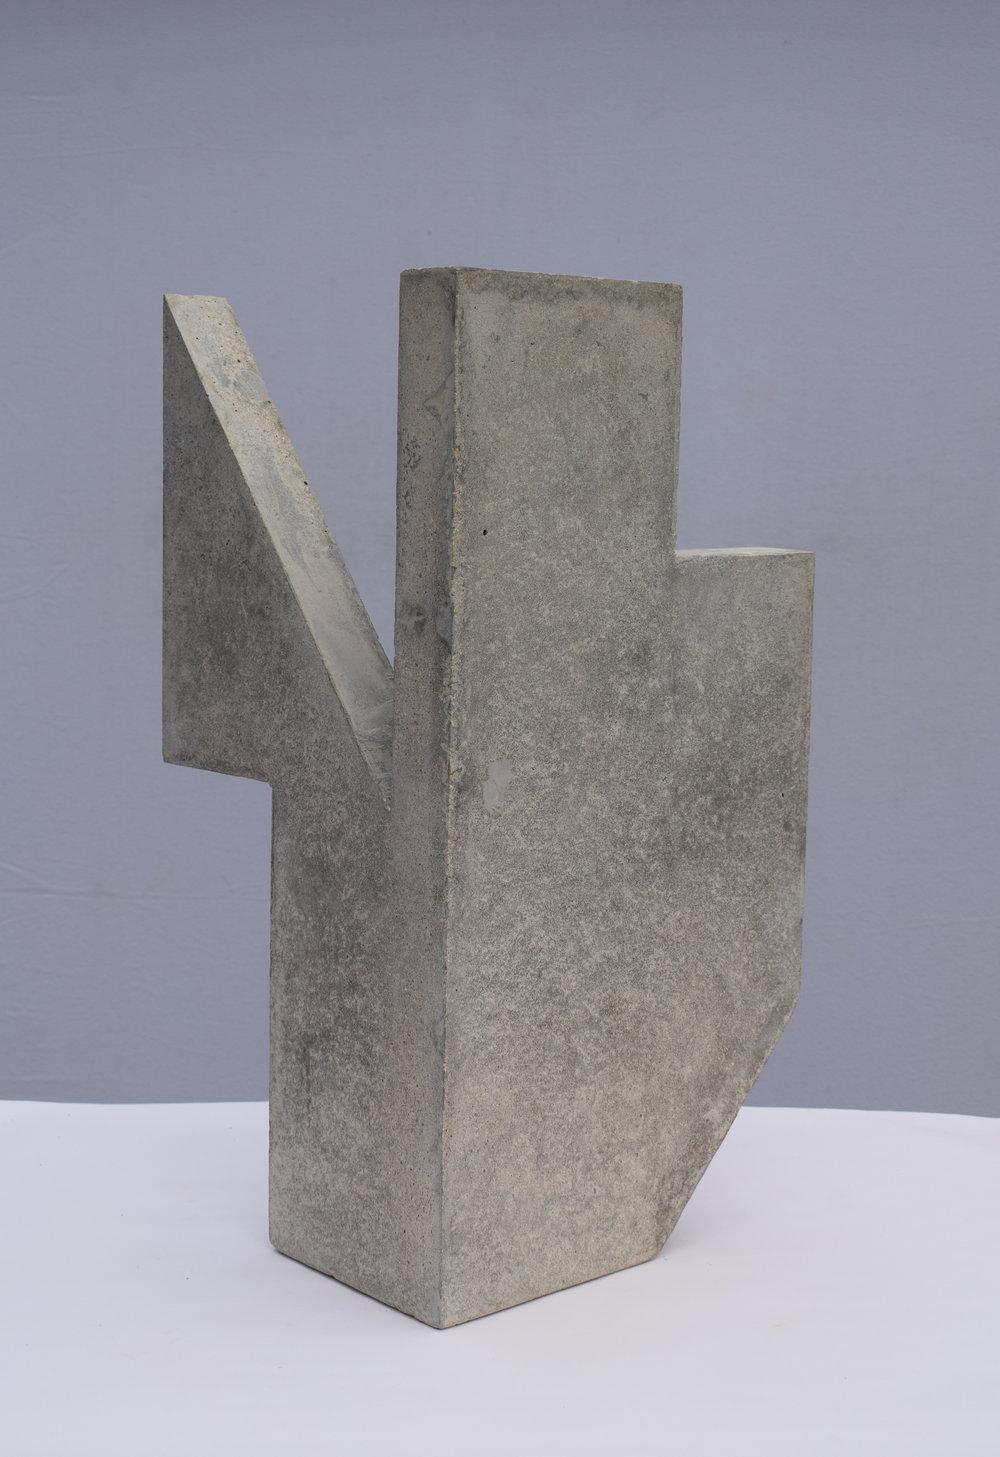 Sangar III (60 × 30 × 30 cm)